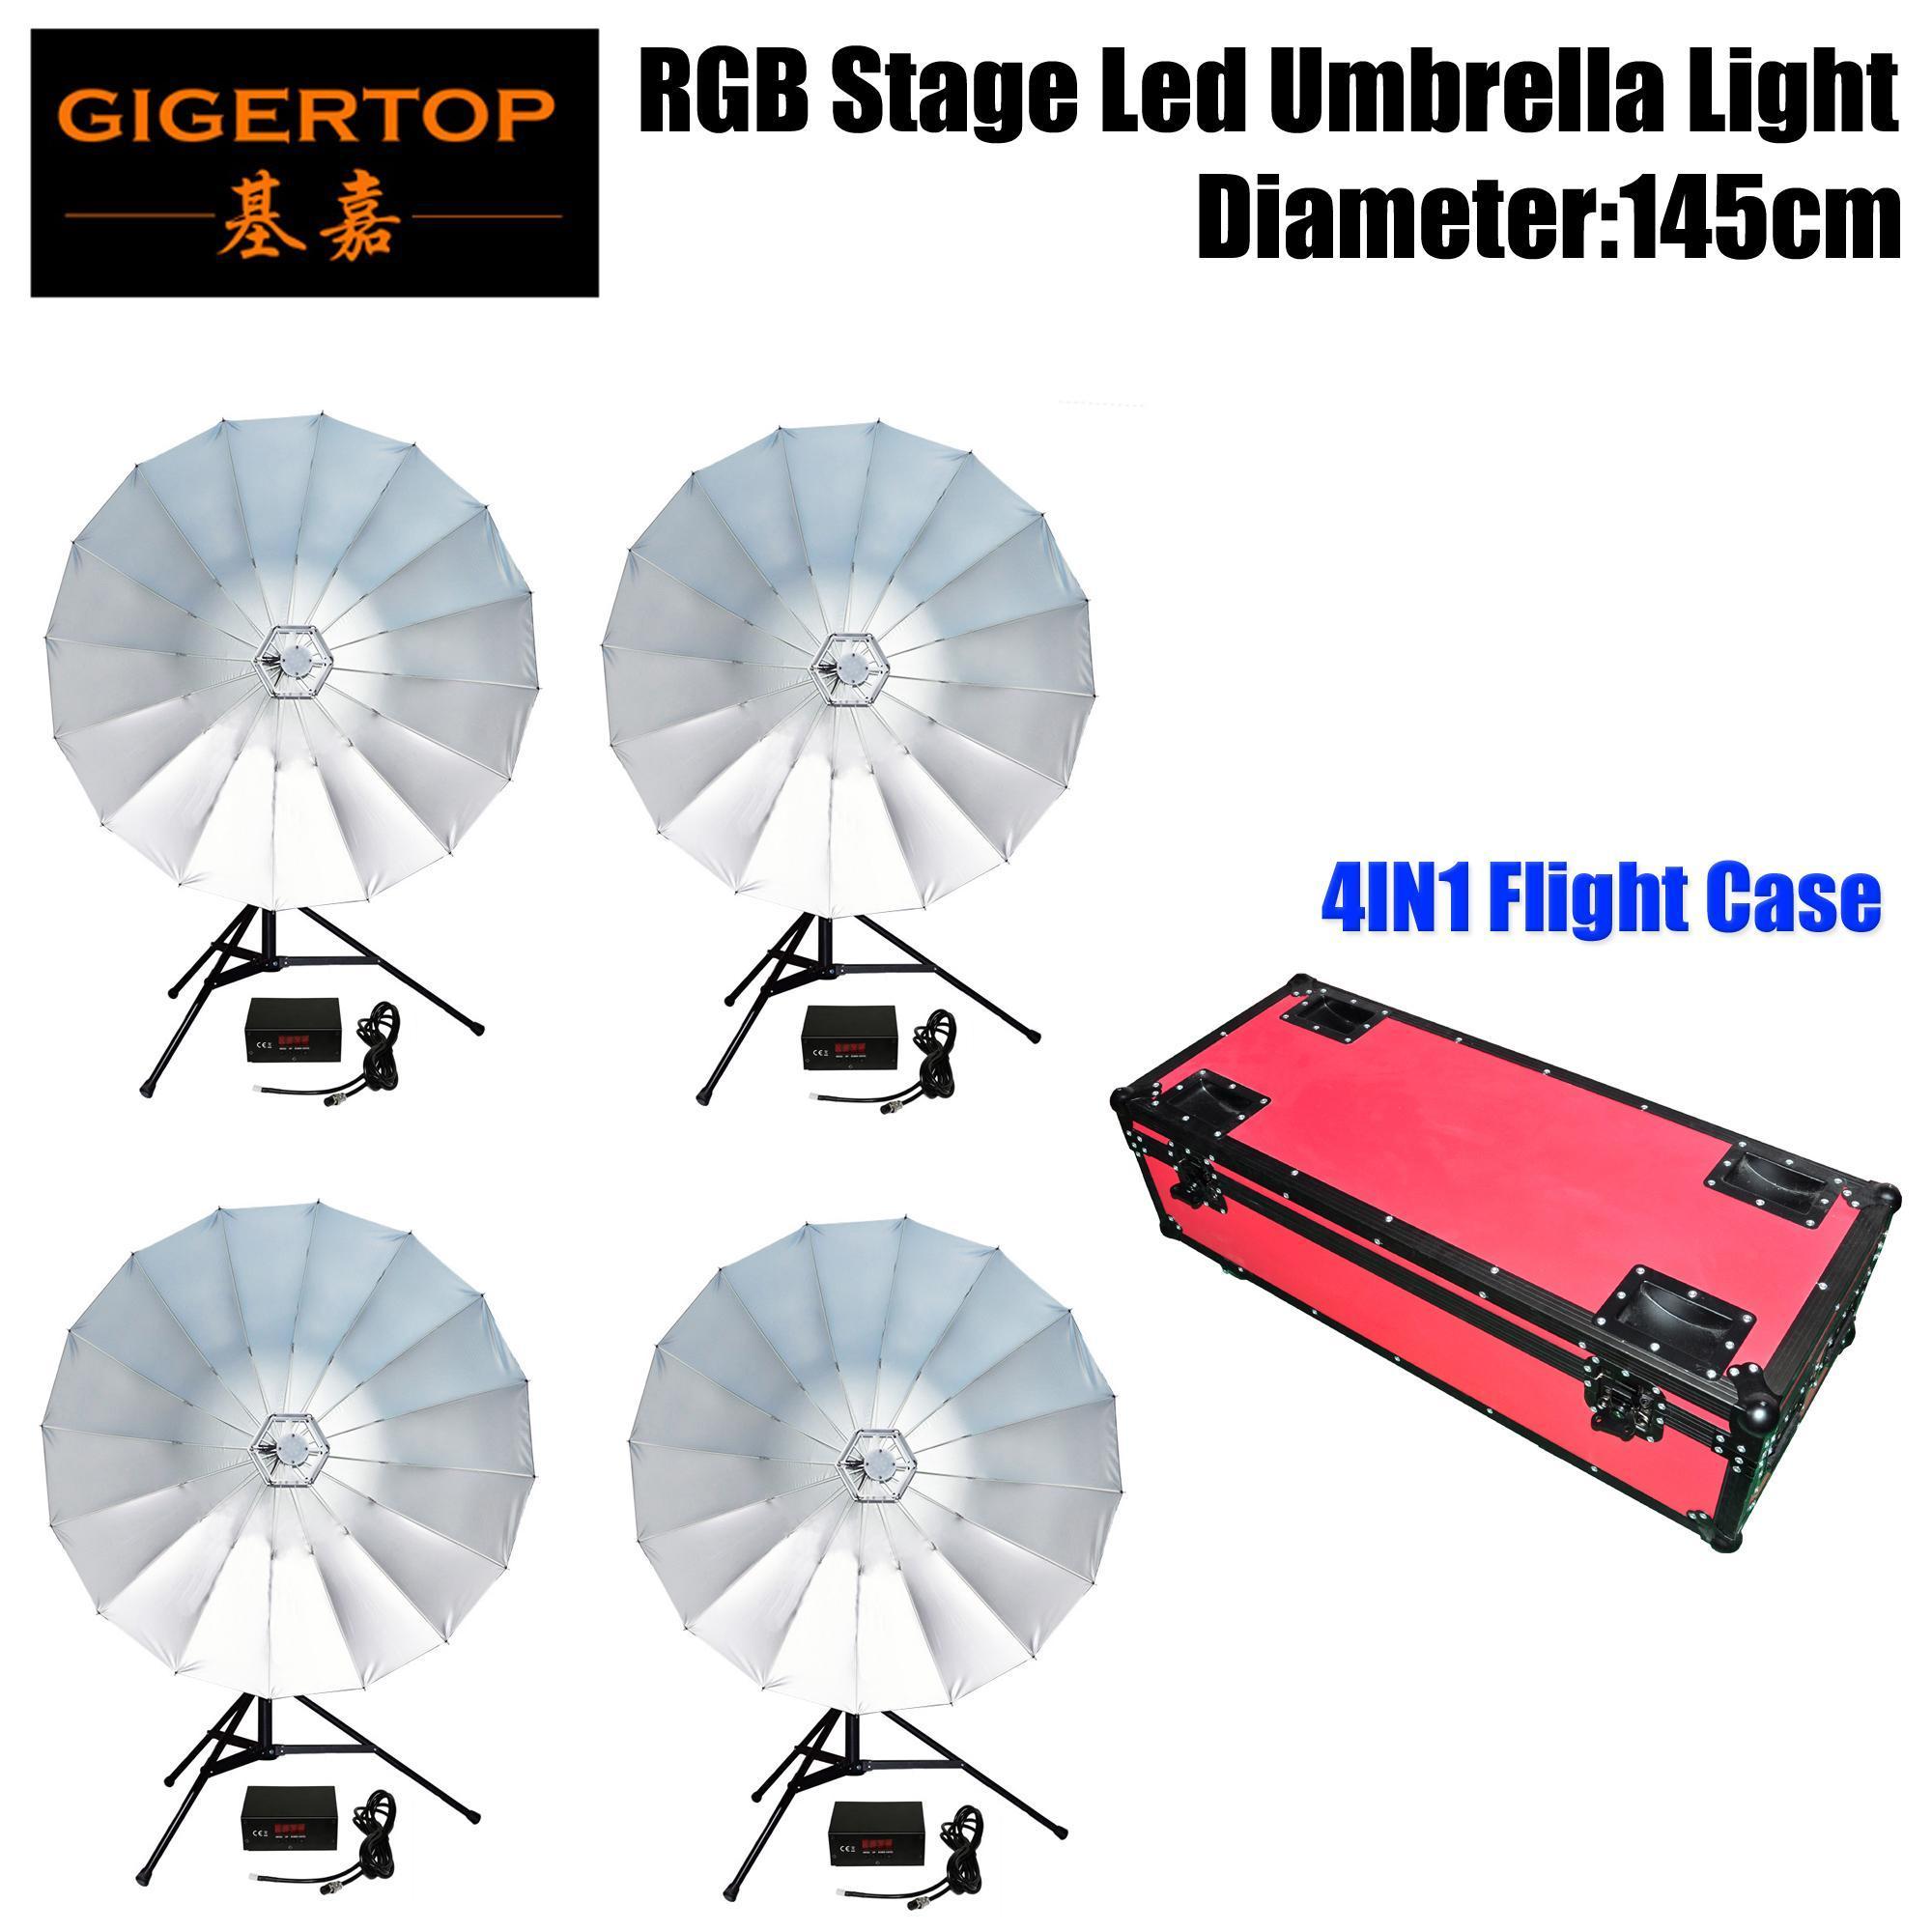 4in1 Red Color Flightcase Pack Indoor Rgb Led Umbrella Professional Stage Lighting Cmy Color Mixing 145cm Open Diameter Tp -Um34